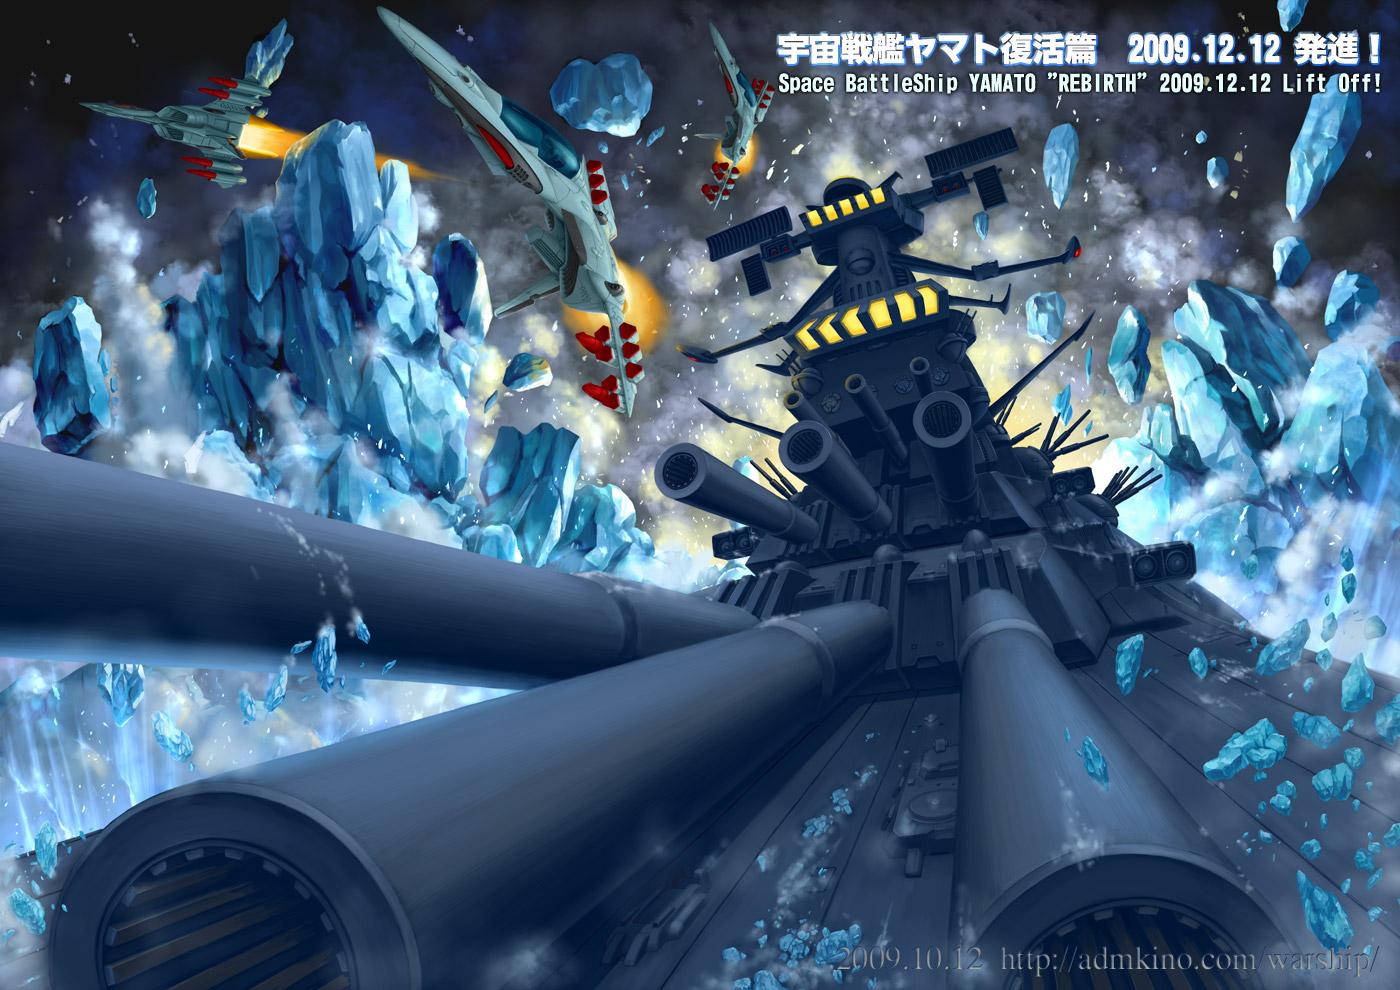 宇宙戦艦更新】宇宙戦艦ヤマト復活篇応援・ヤマト発進!2220: 大海艦隊 ...